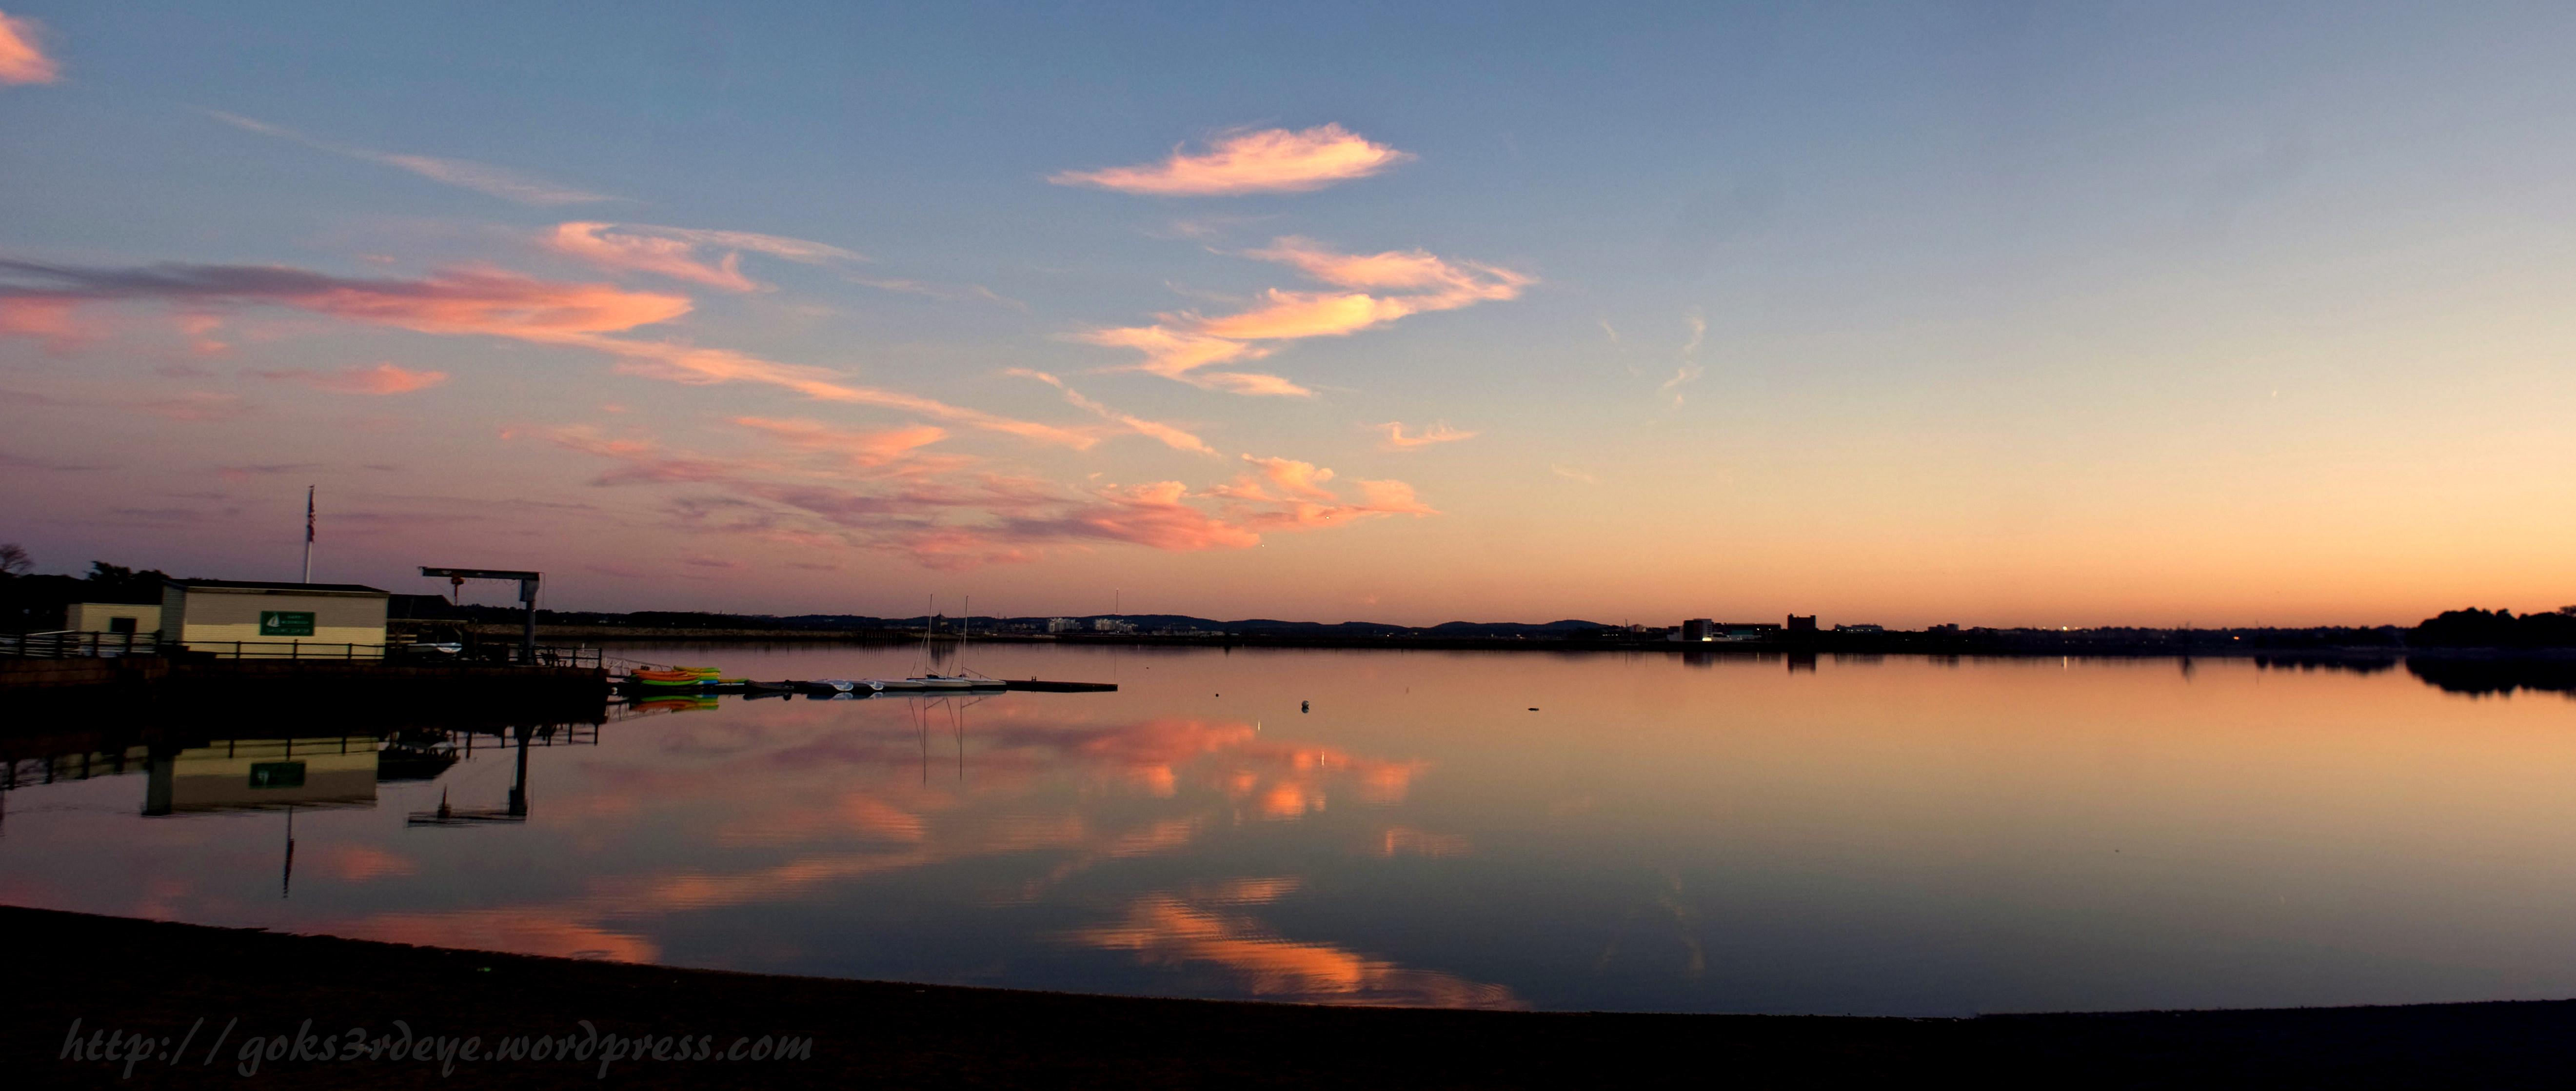 Beautiful Evening Sky Reflection | The Sensations